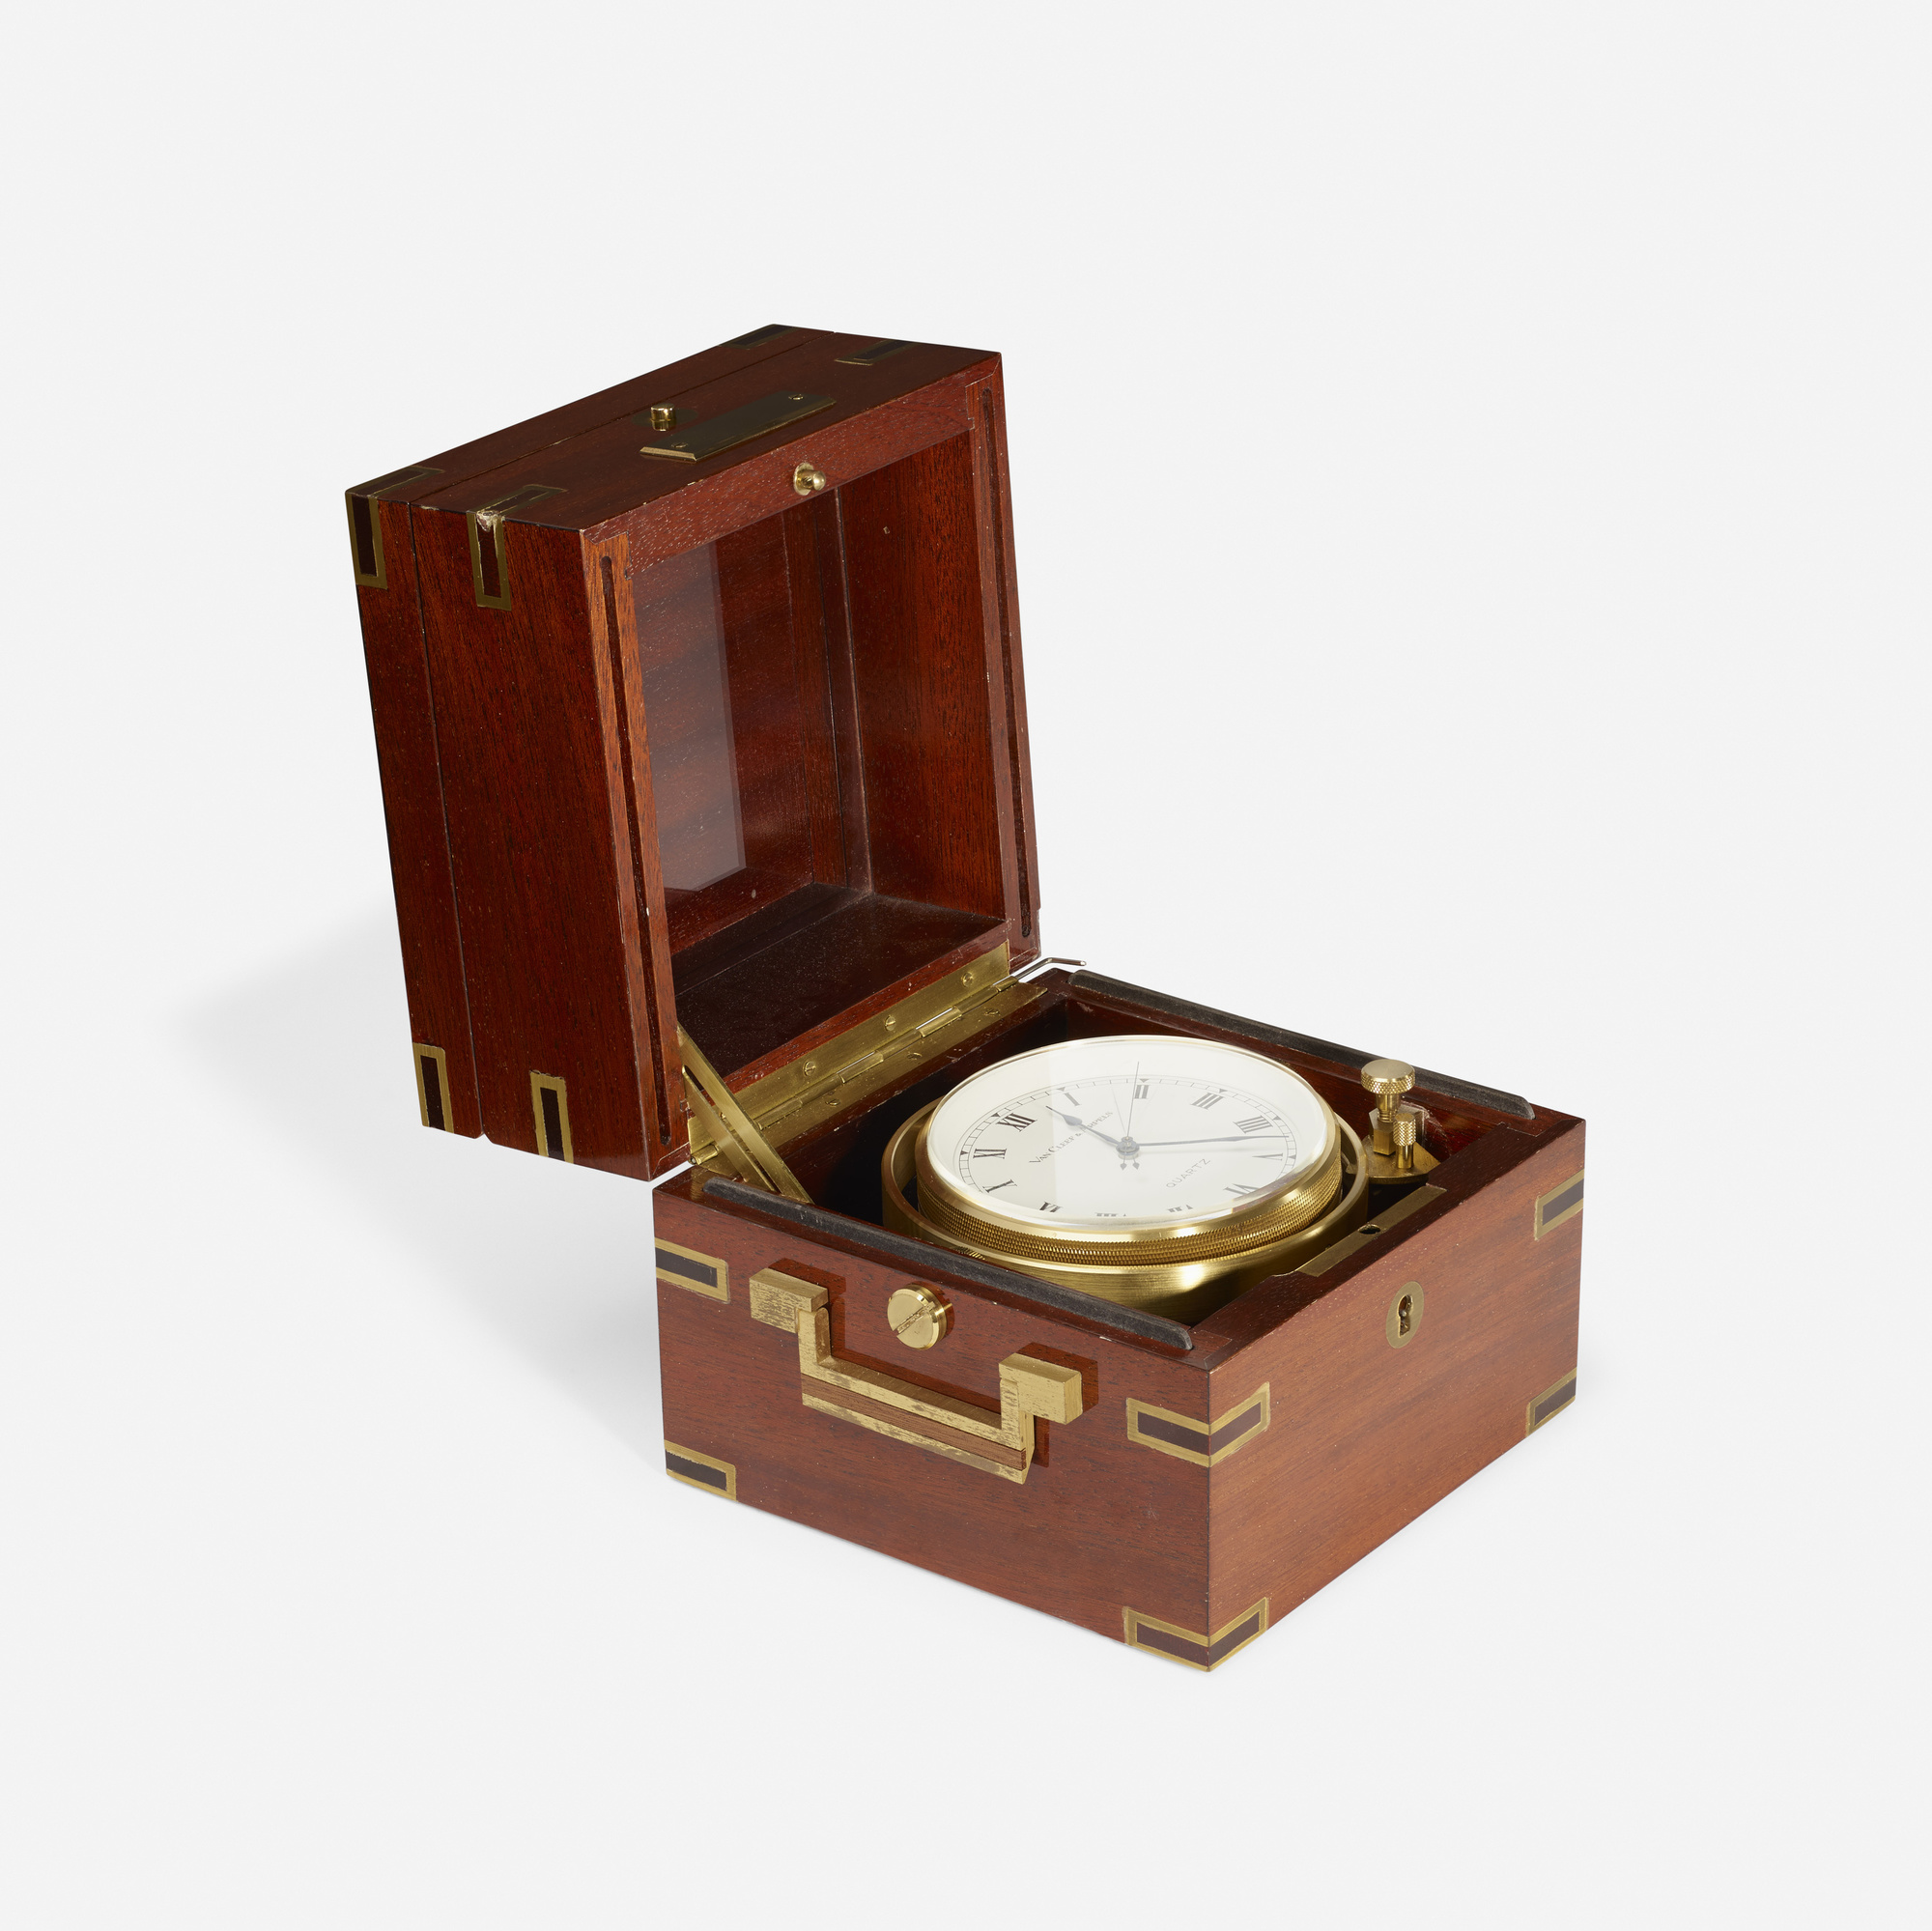 137: Van Cleef & Arpels / A nautical table clock (1 of 2)